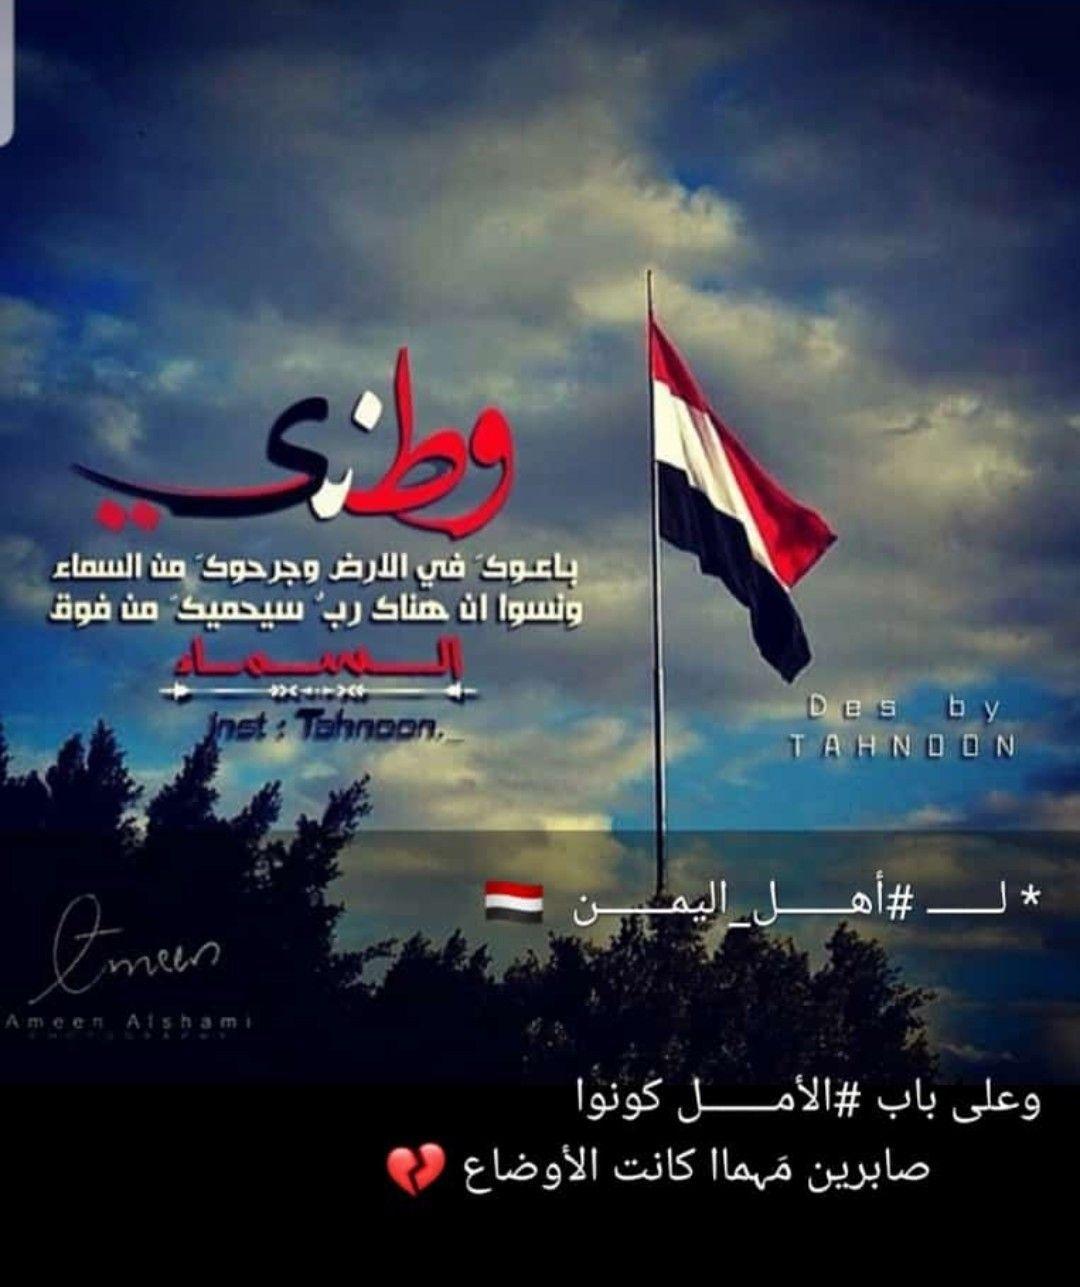 آخـبـروا بـلادي بـ انــي احـبـهـا حـتـئ لـو إخـتفـت مـلامحـهـــا الـجـمـيـلـﮪ Islamic Art Yemen Poster